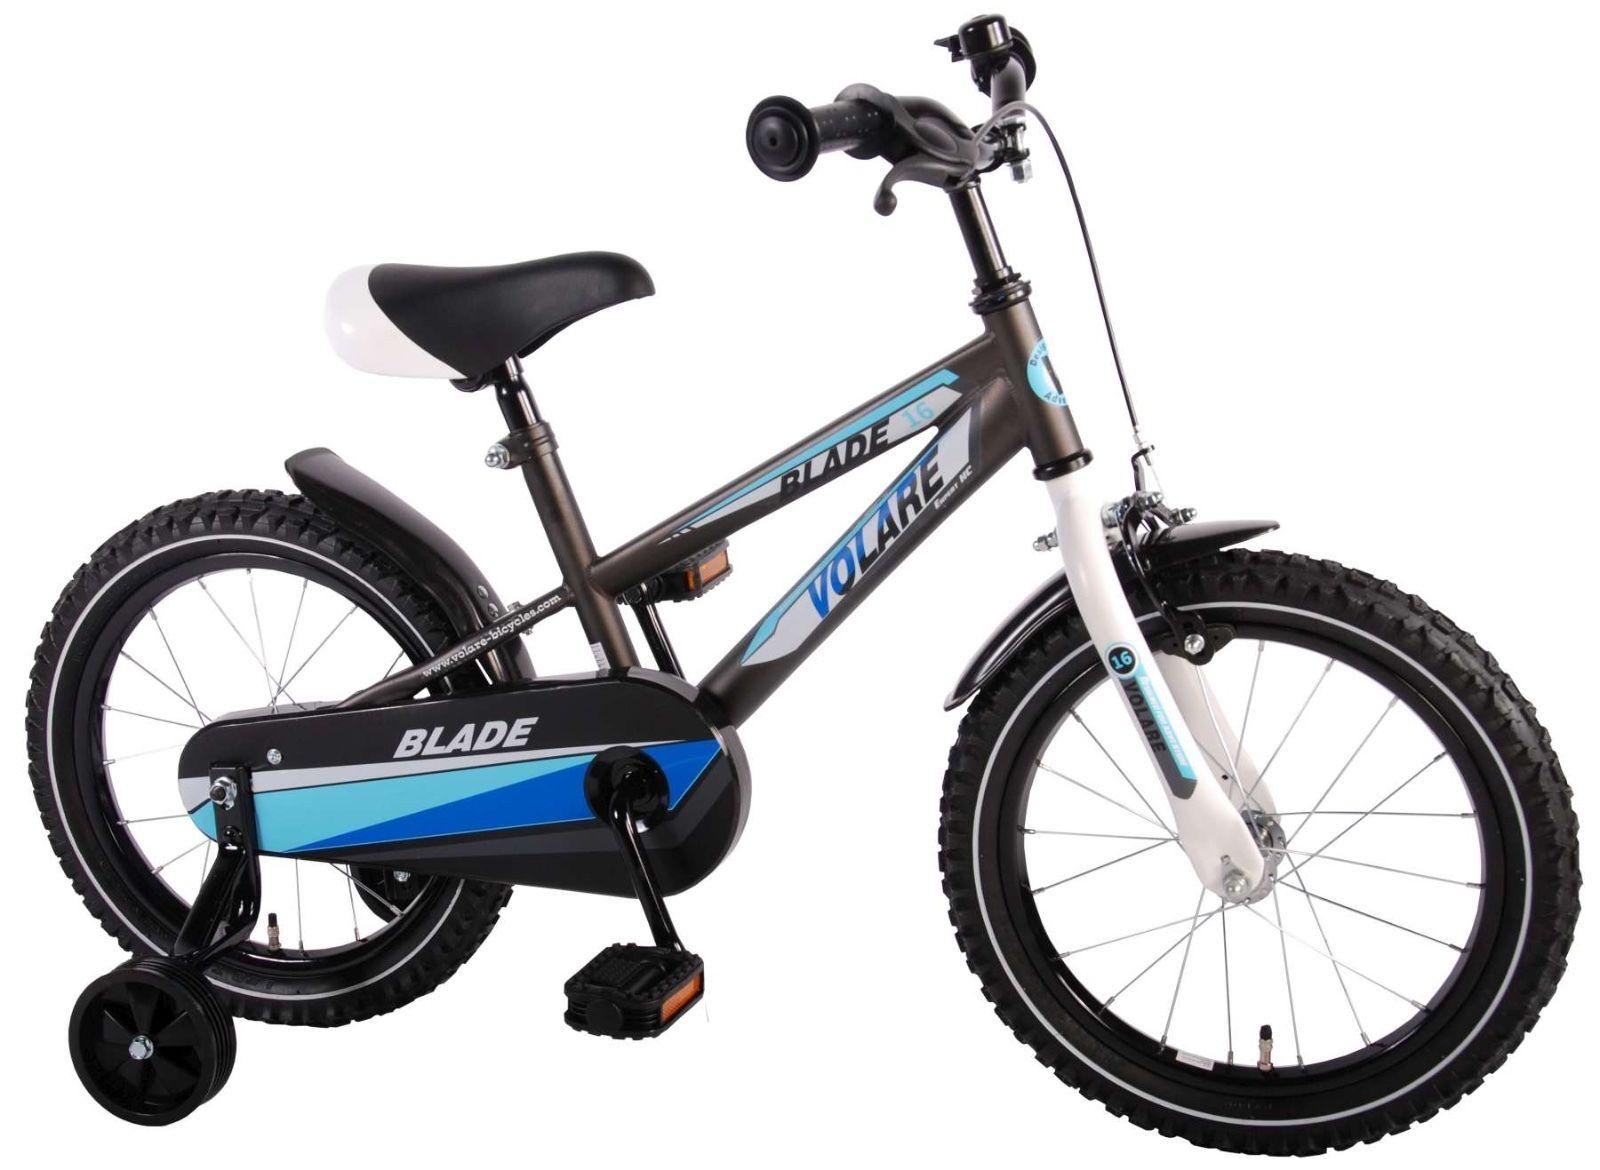 16 zoll fahrrad qualit ts kinderfahrrad mit st tzr der. Black Bedroom Furniture Sets. Home Design Ideas